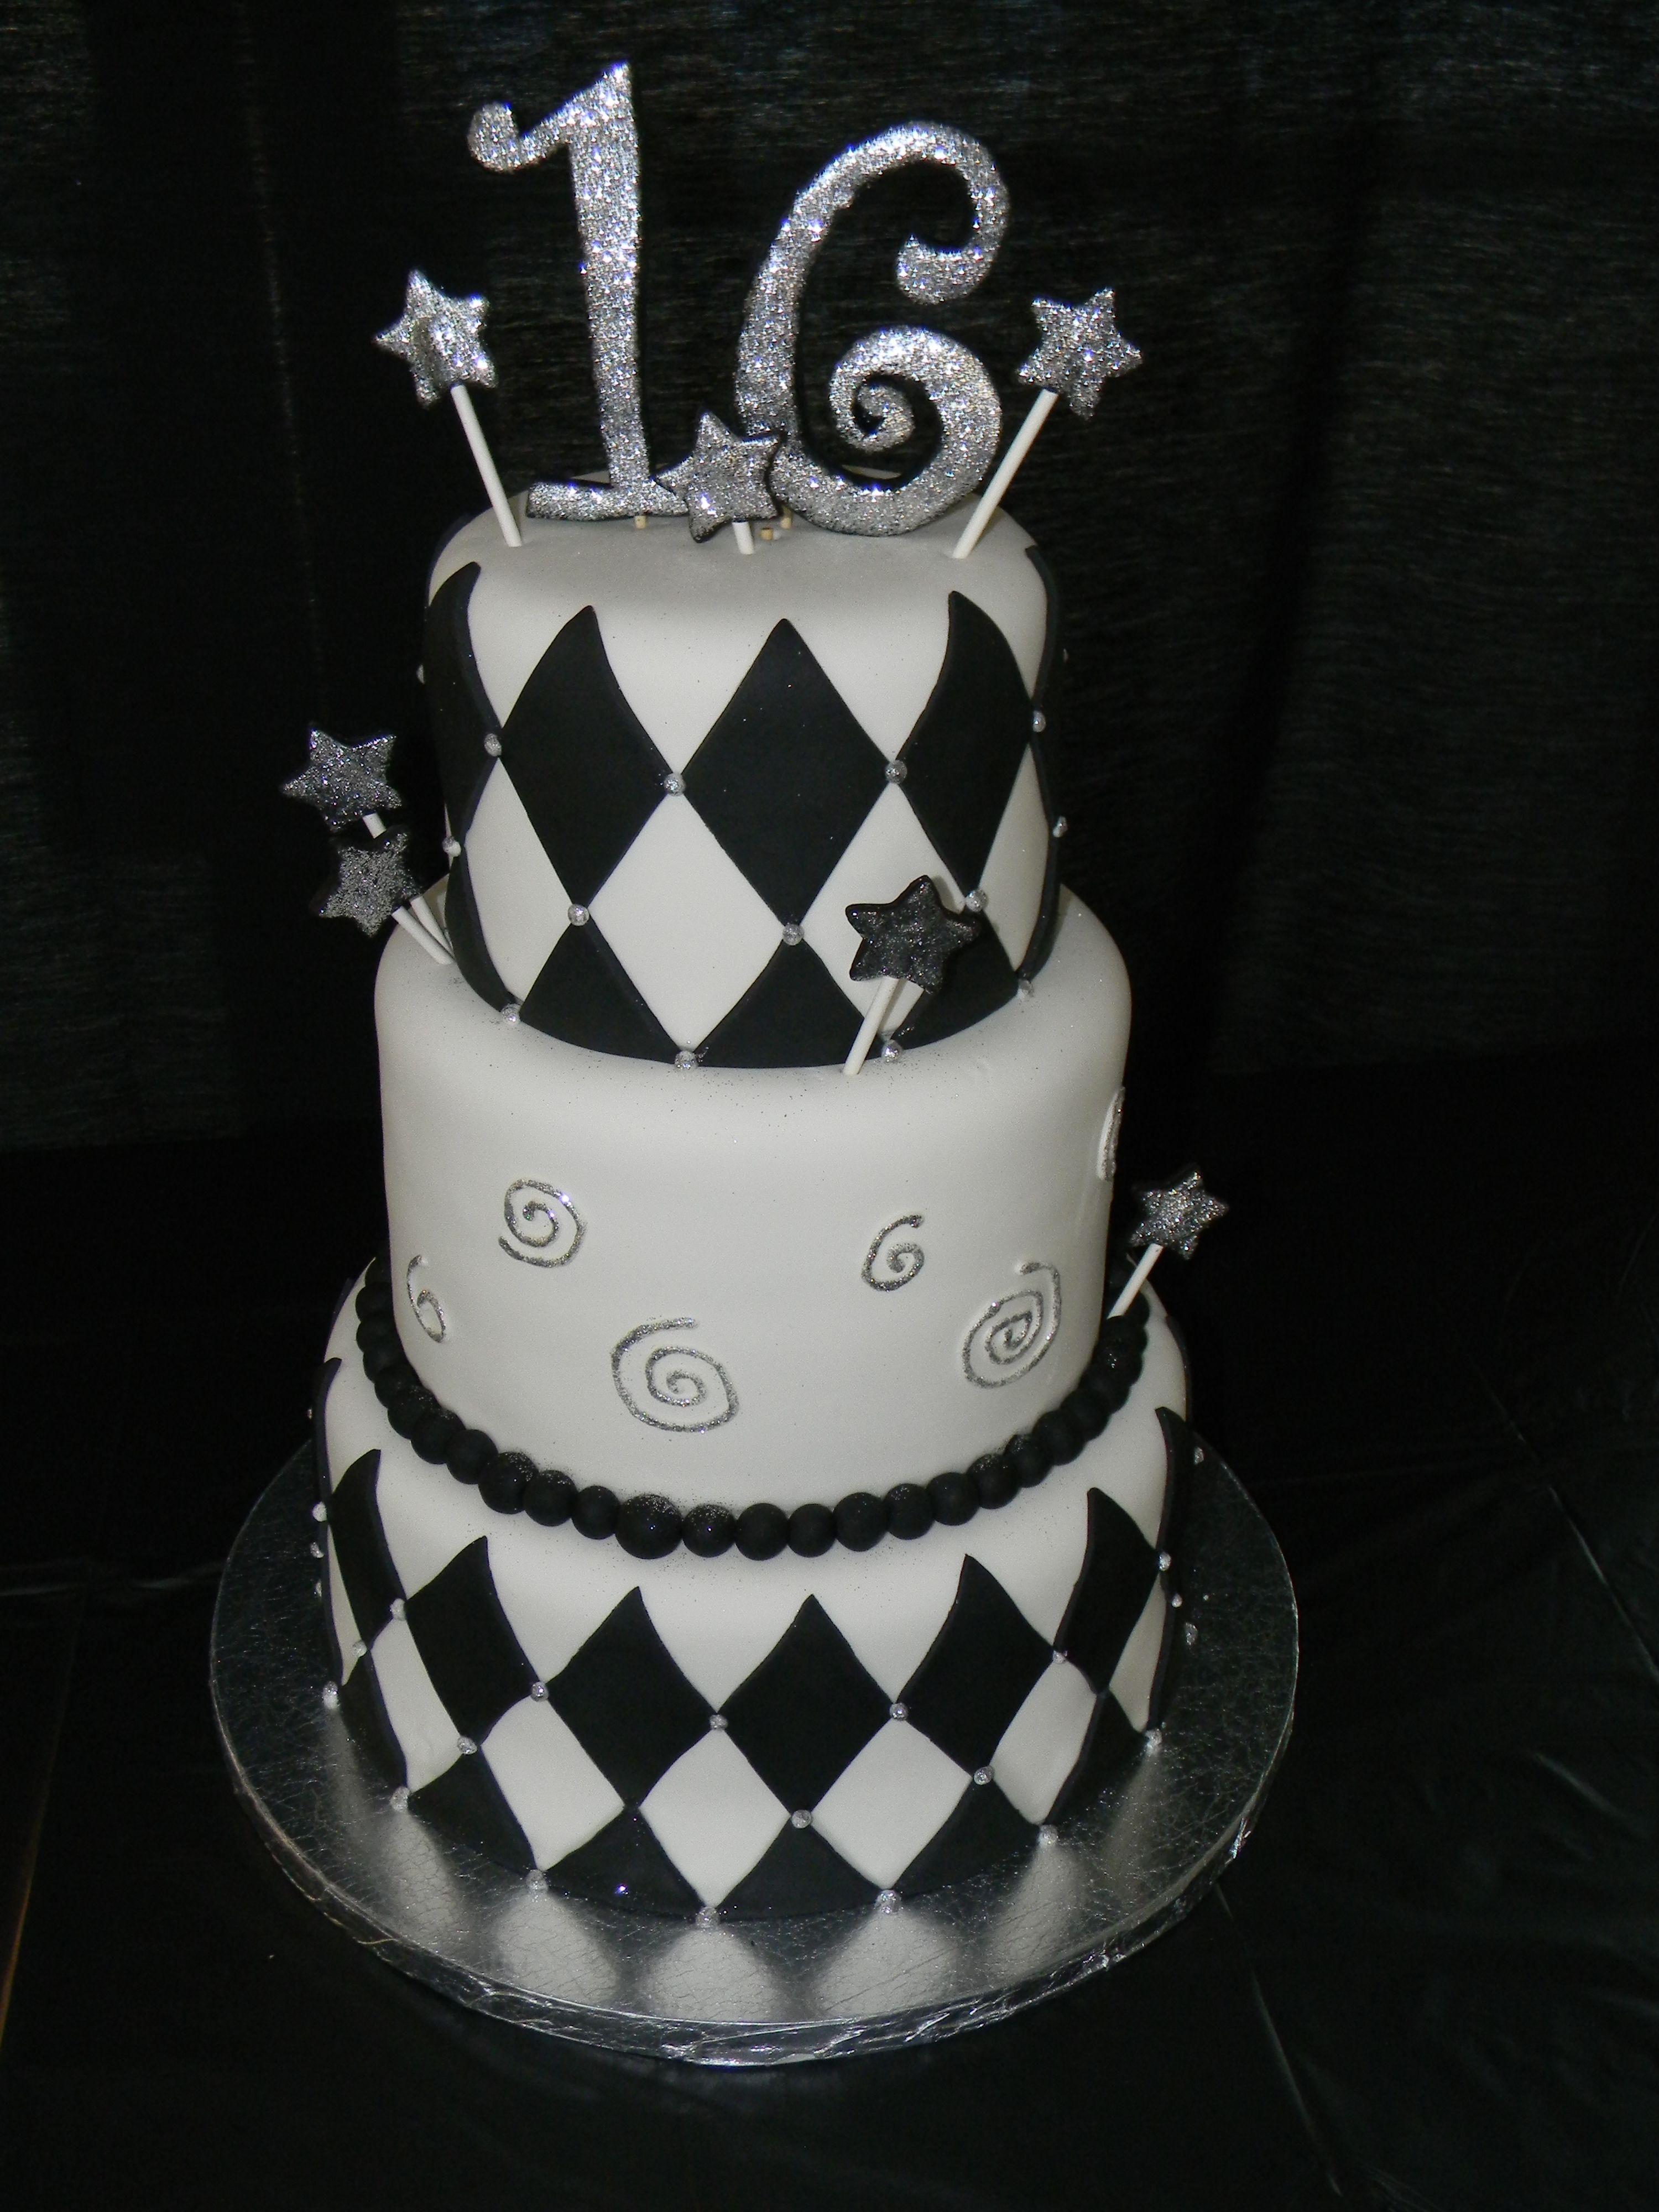 16th birthday cakes for boys